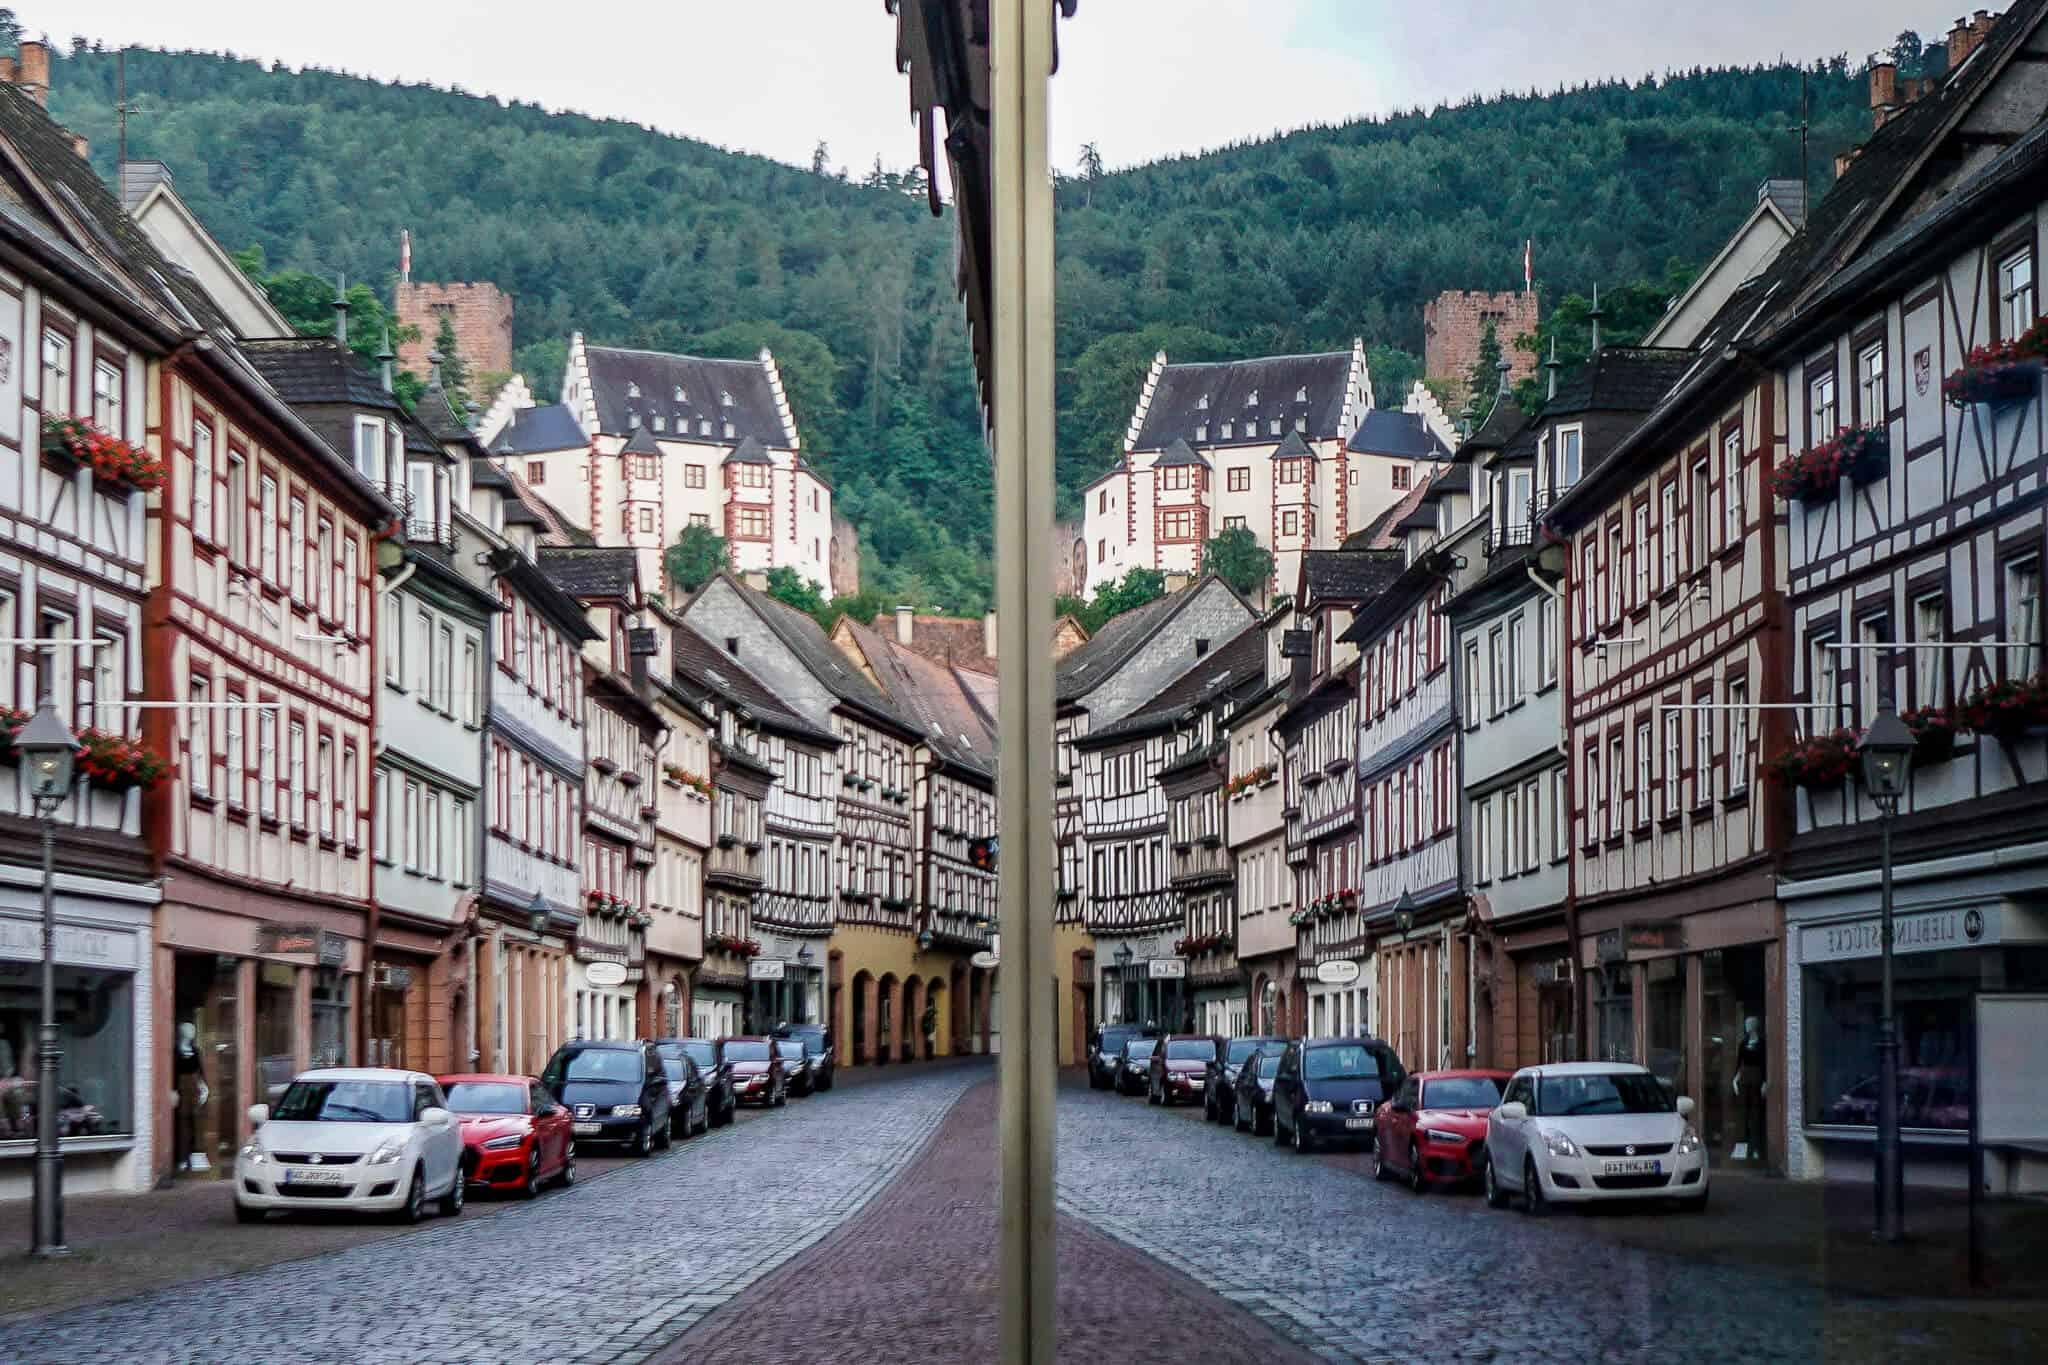 Spiegelung Altstadt Miltenberg